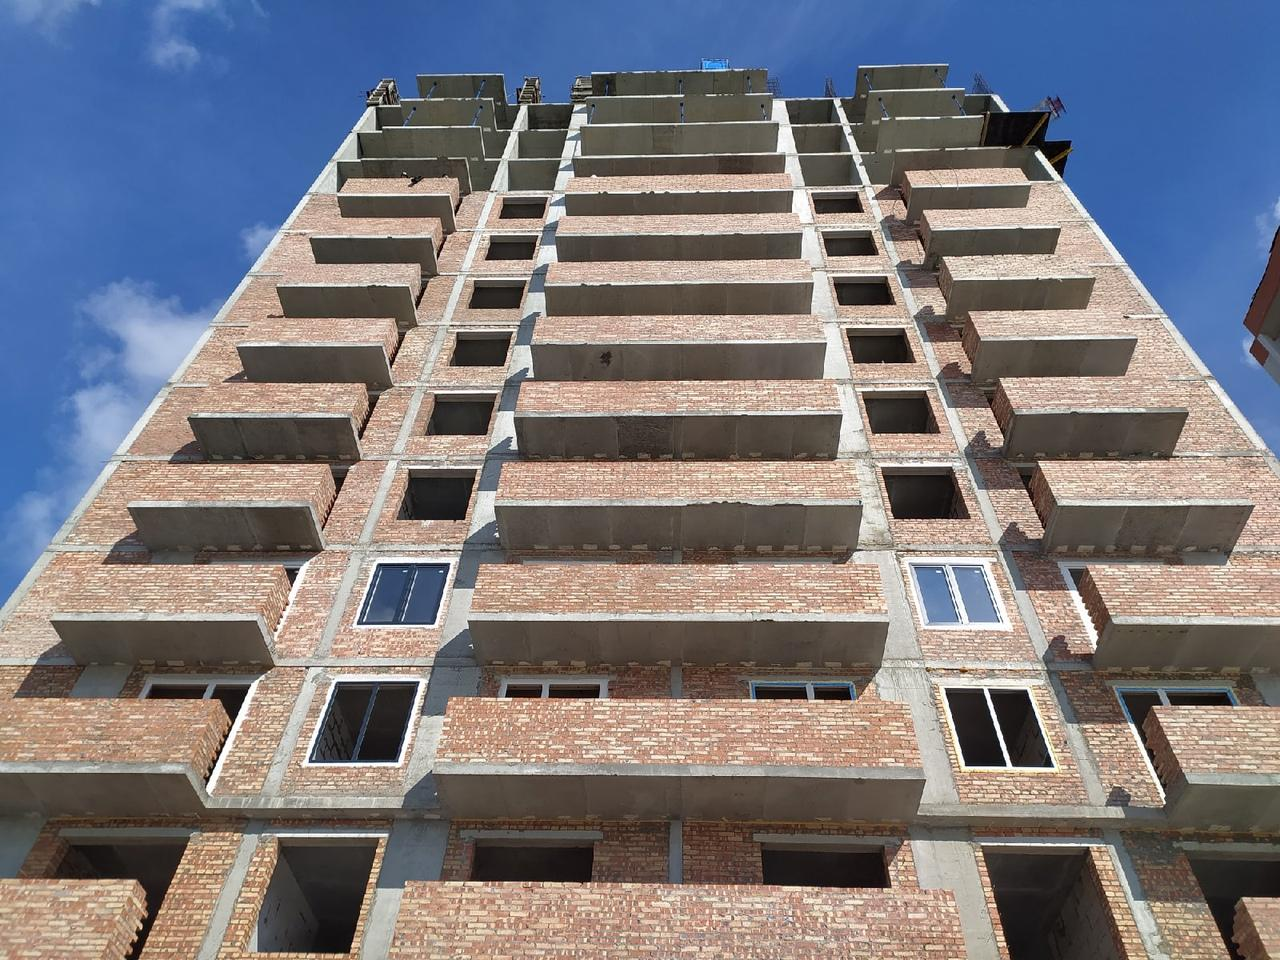 Фото Двор дома продали по частям за долги застройщика в Новосибирске 2